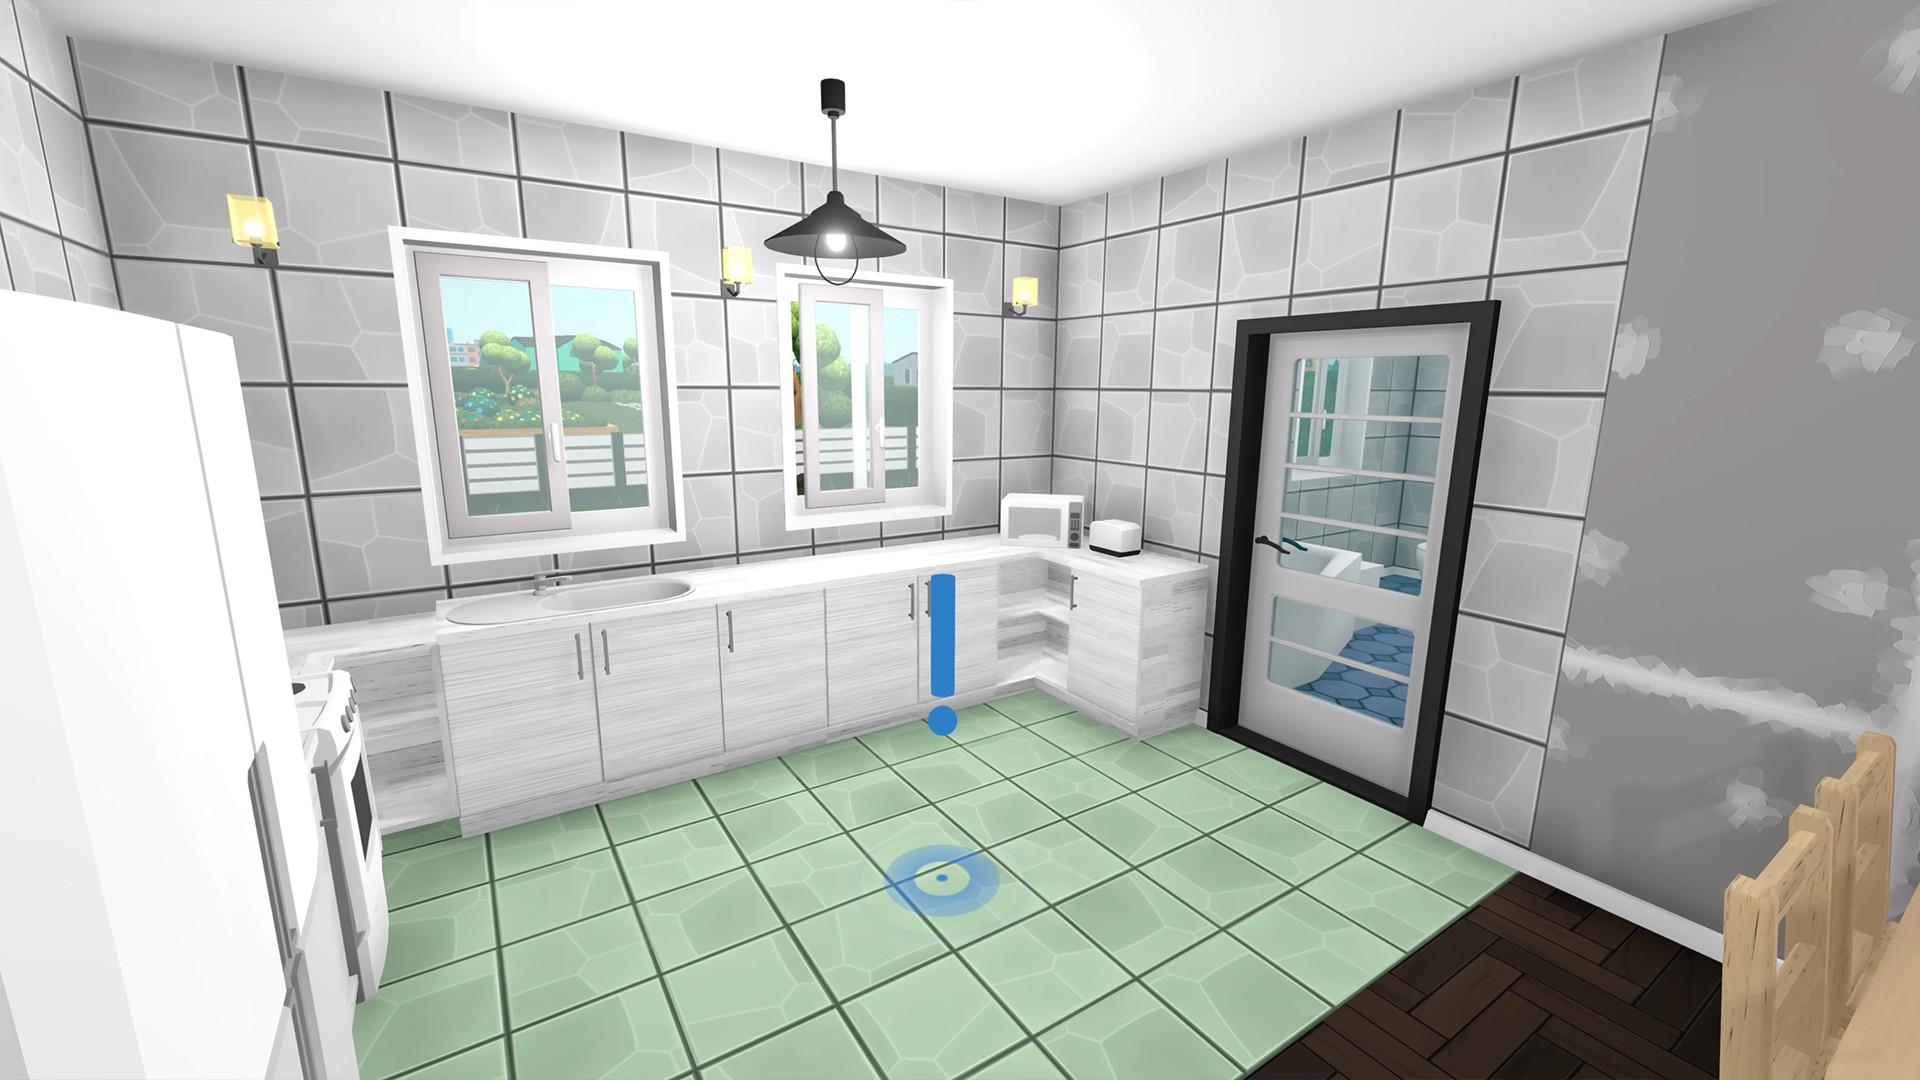 Oculus Quest 游戏《House Flipper VR》房产达人插图(2)